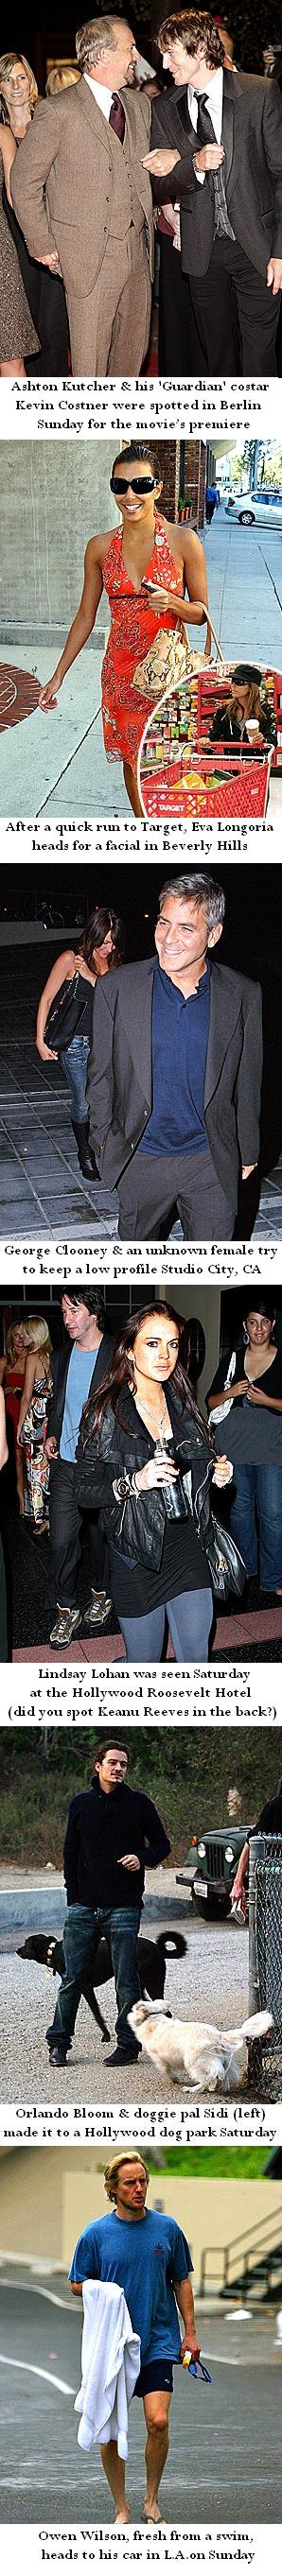 celebrific-sighting-montage-10-3-2006.JPG